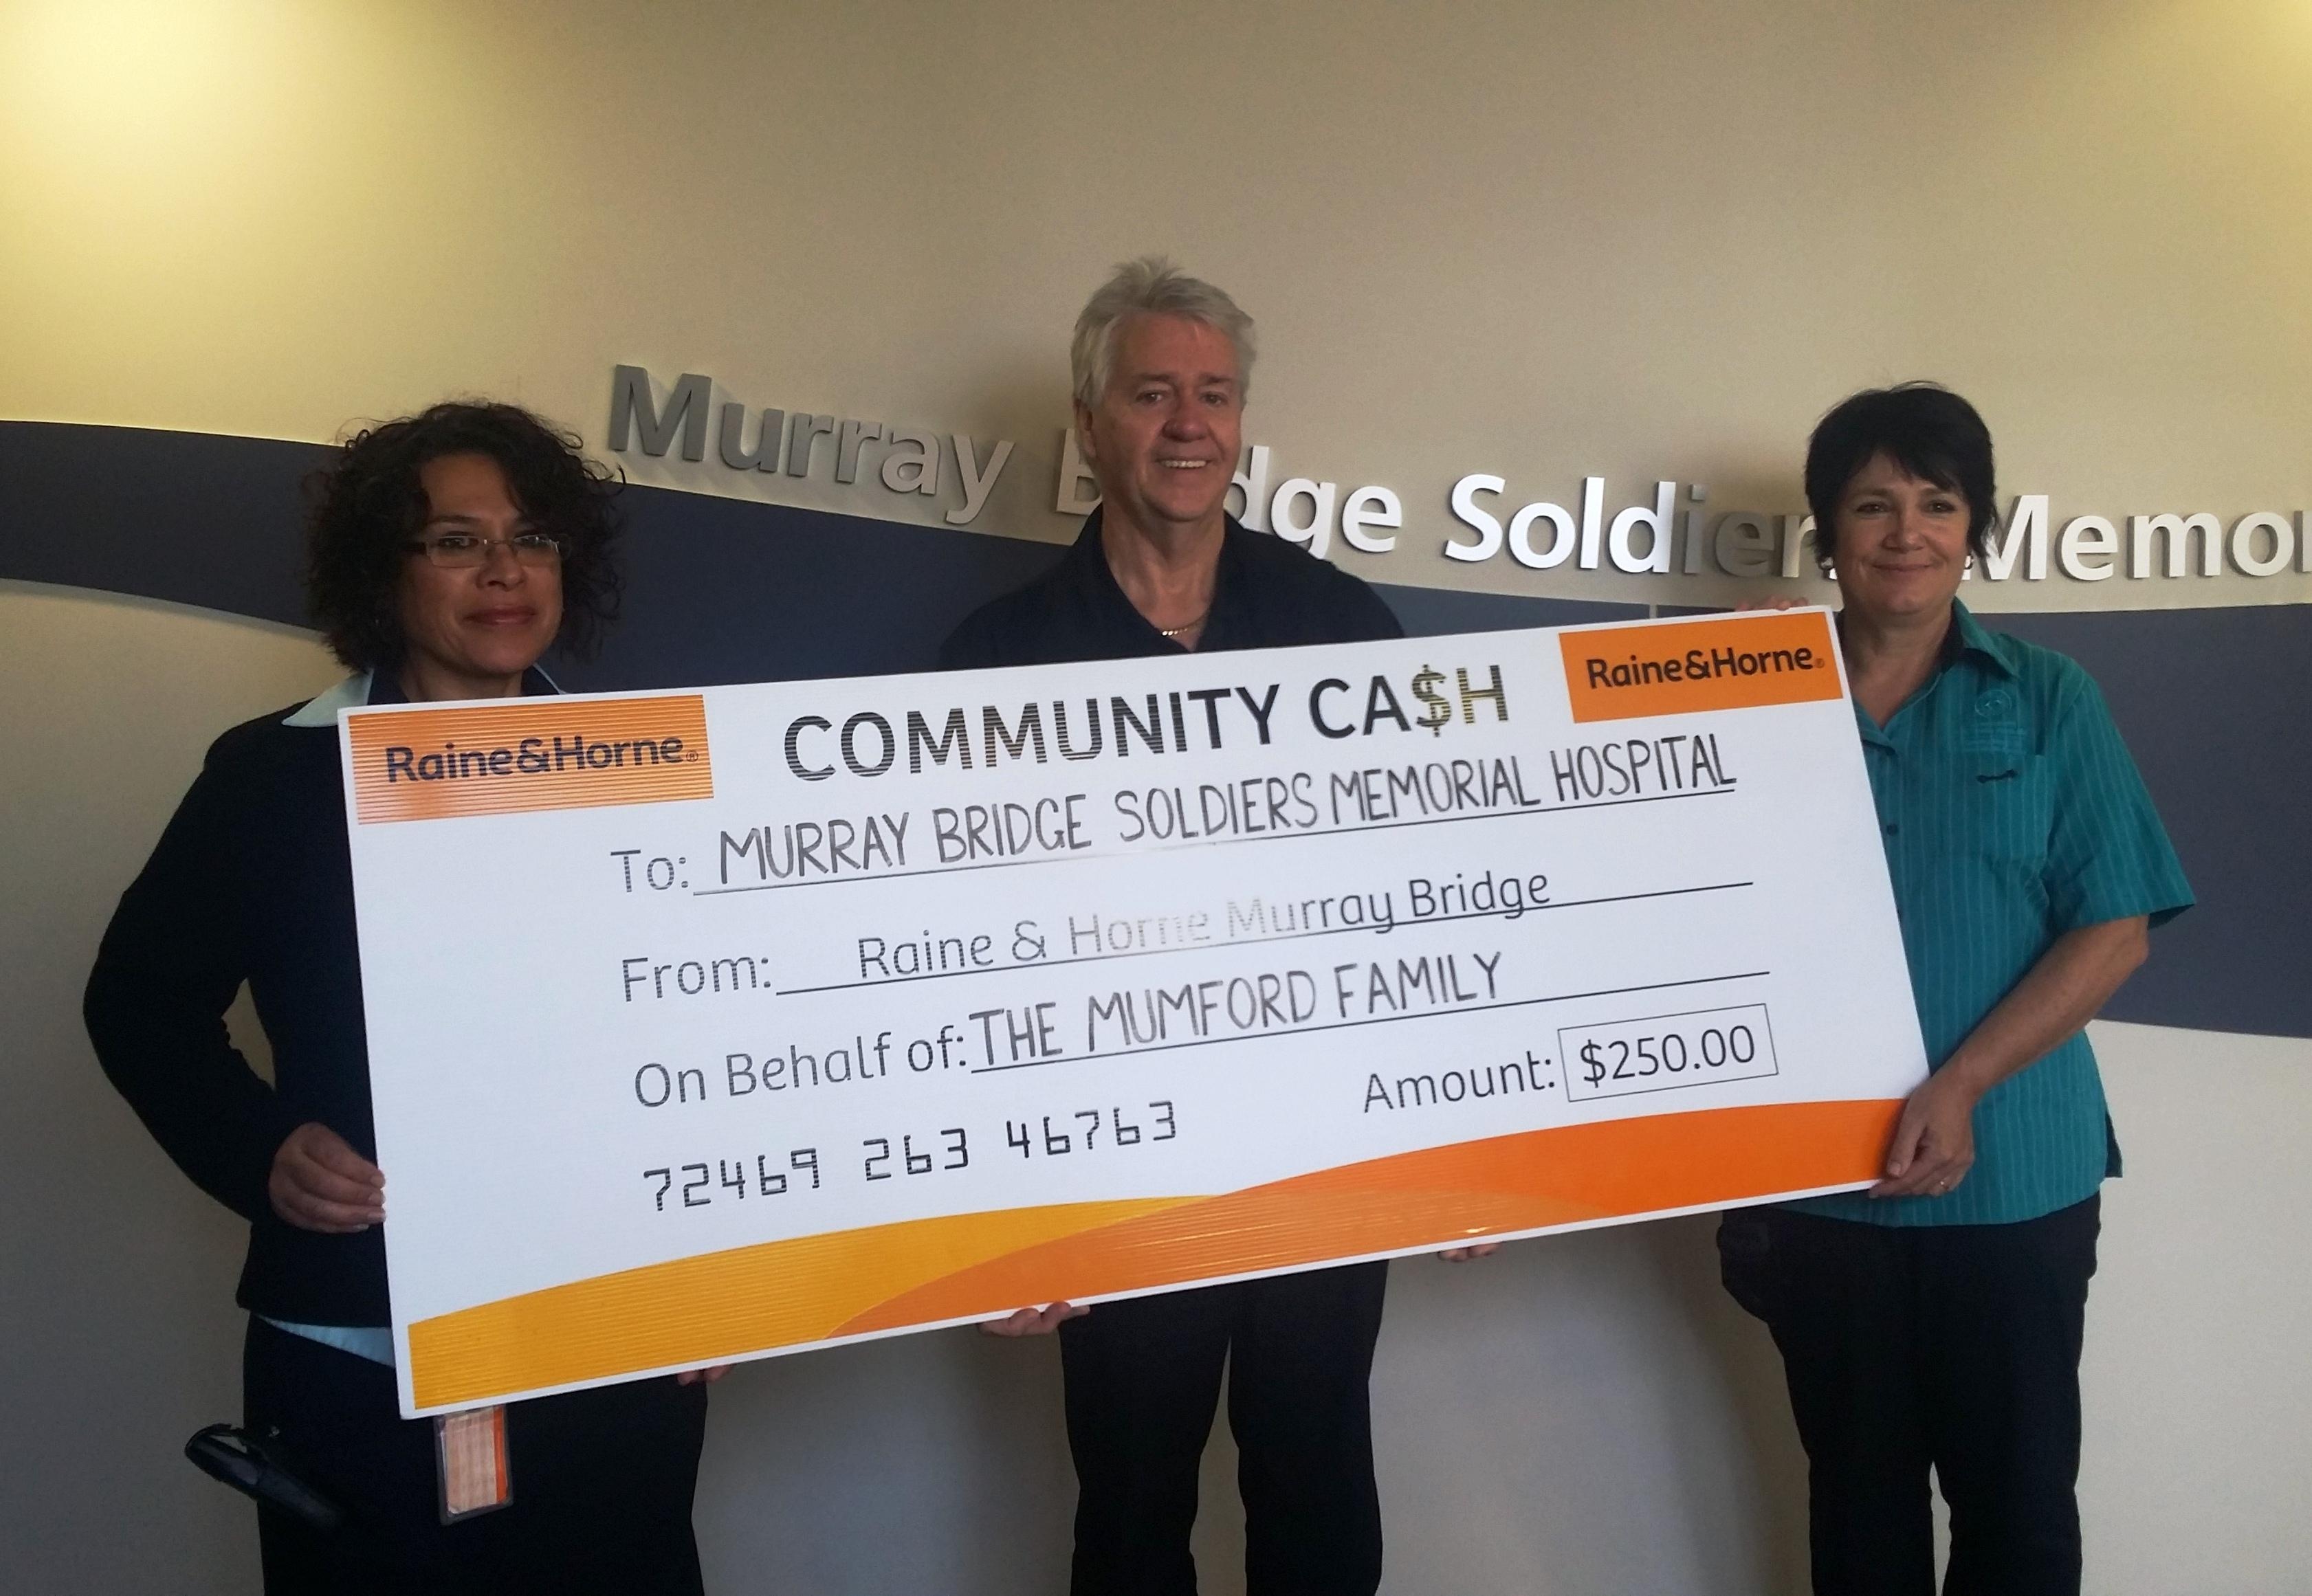 Community Cash - Murray Bridge Hospital